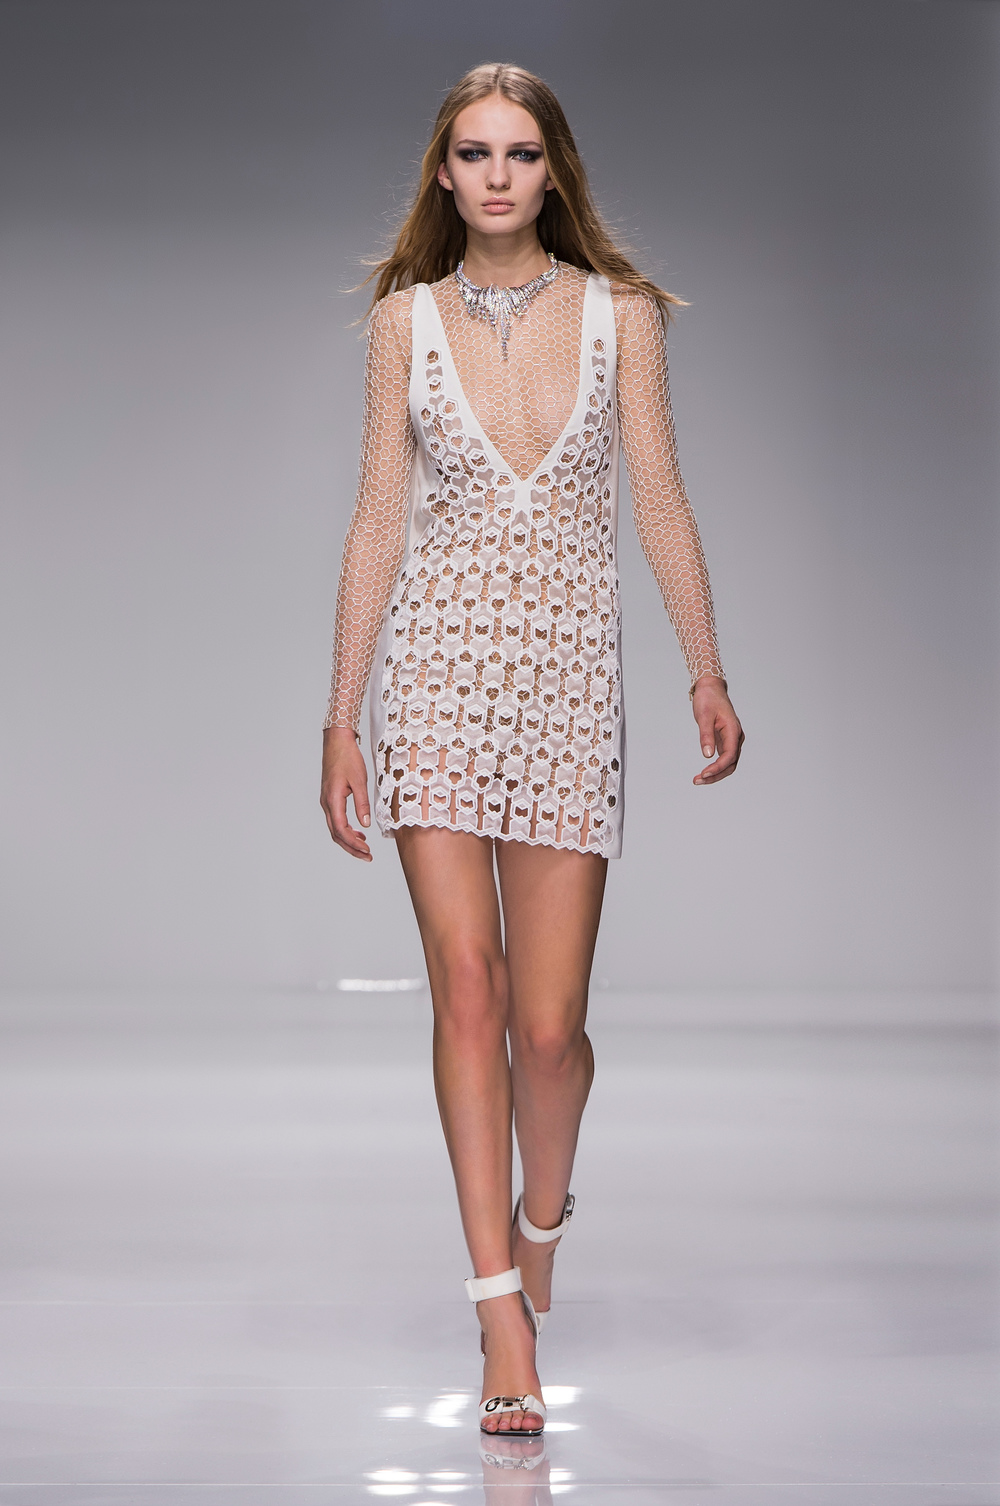 Atelier Versace SS16_Look 6.JPG